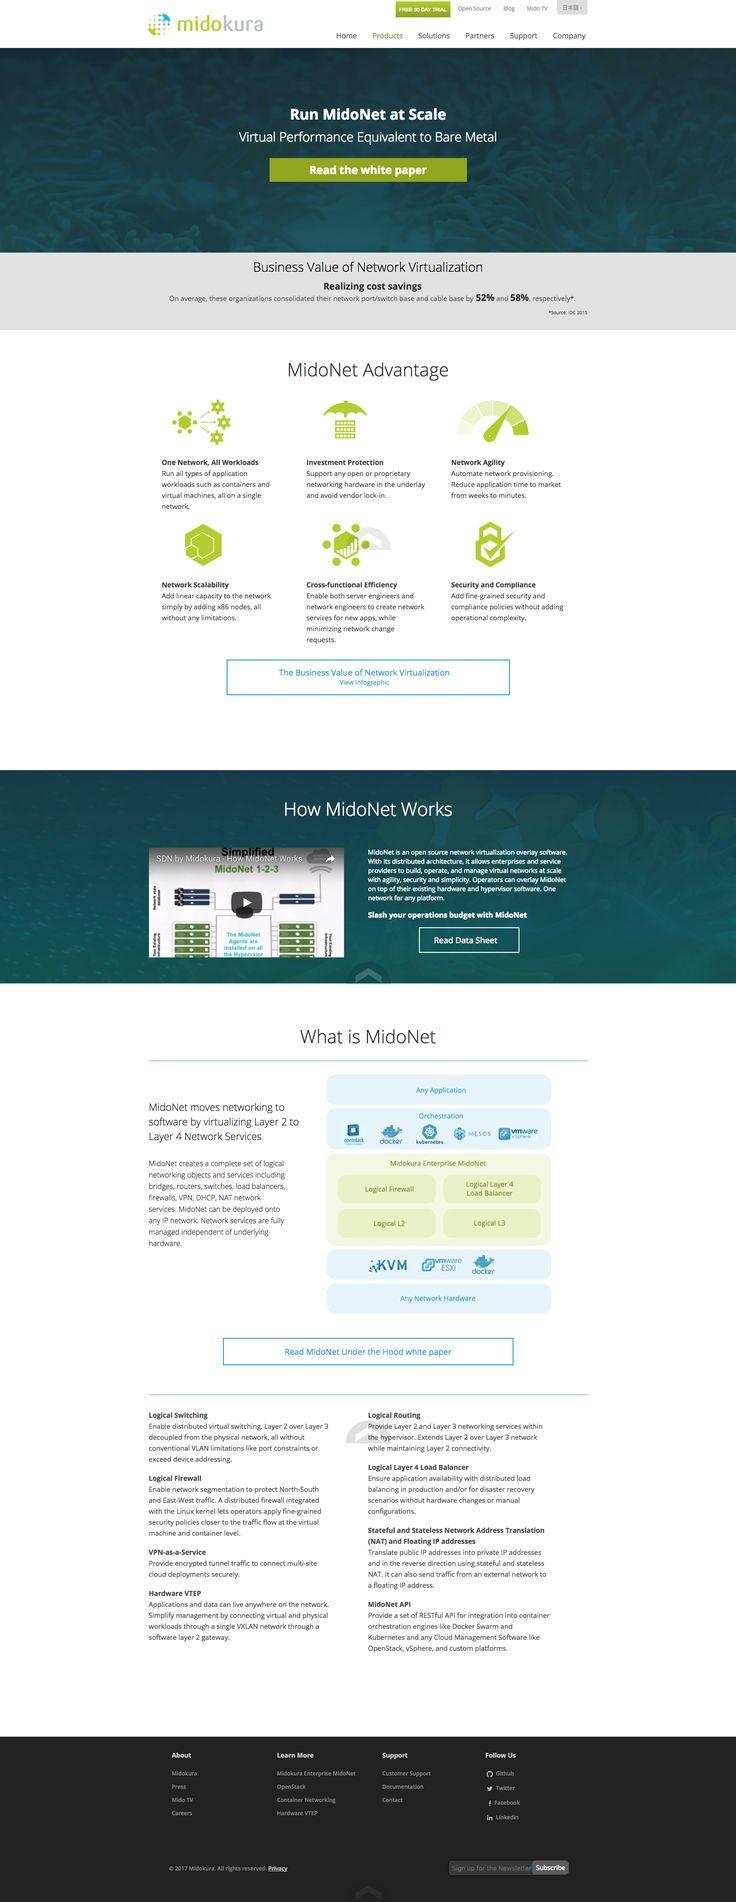 Midokura Interactive Design